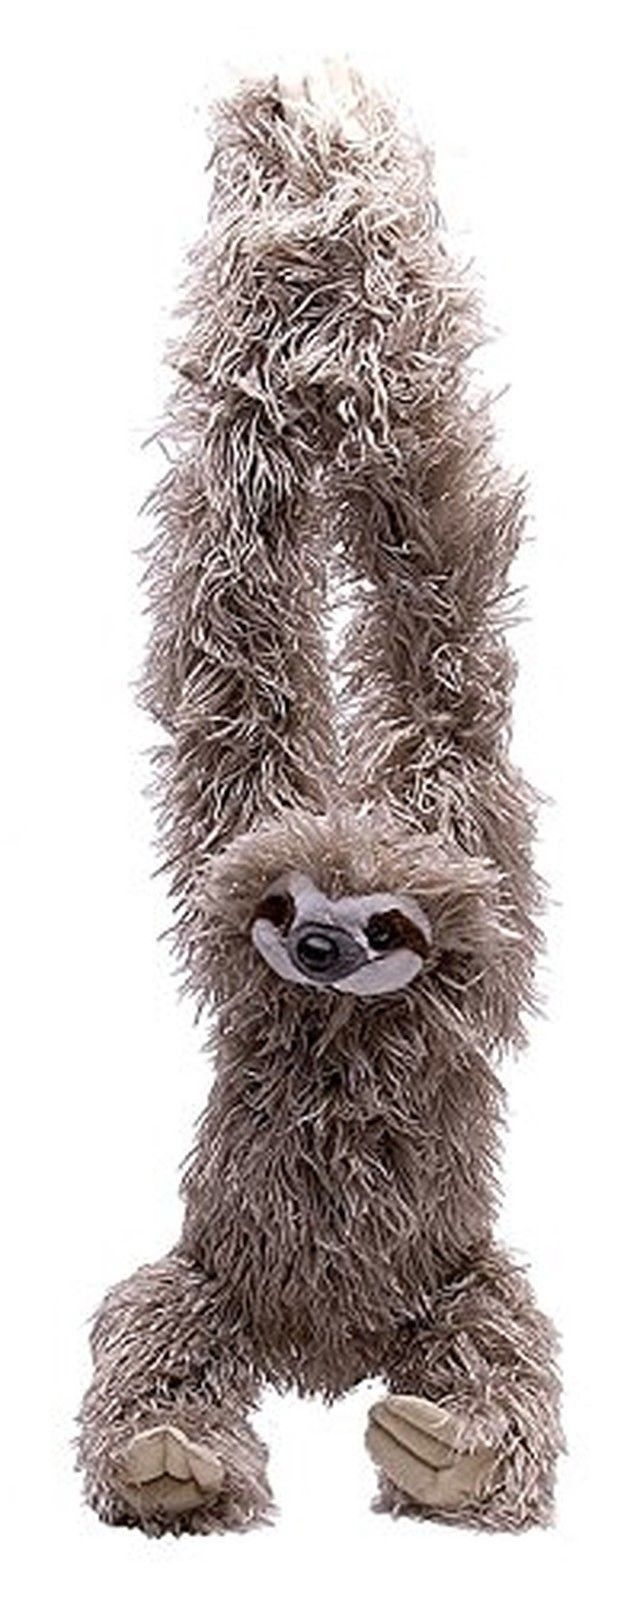 Wild Republic Hanging 3 Toed Sloth Sloth stuffed animal